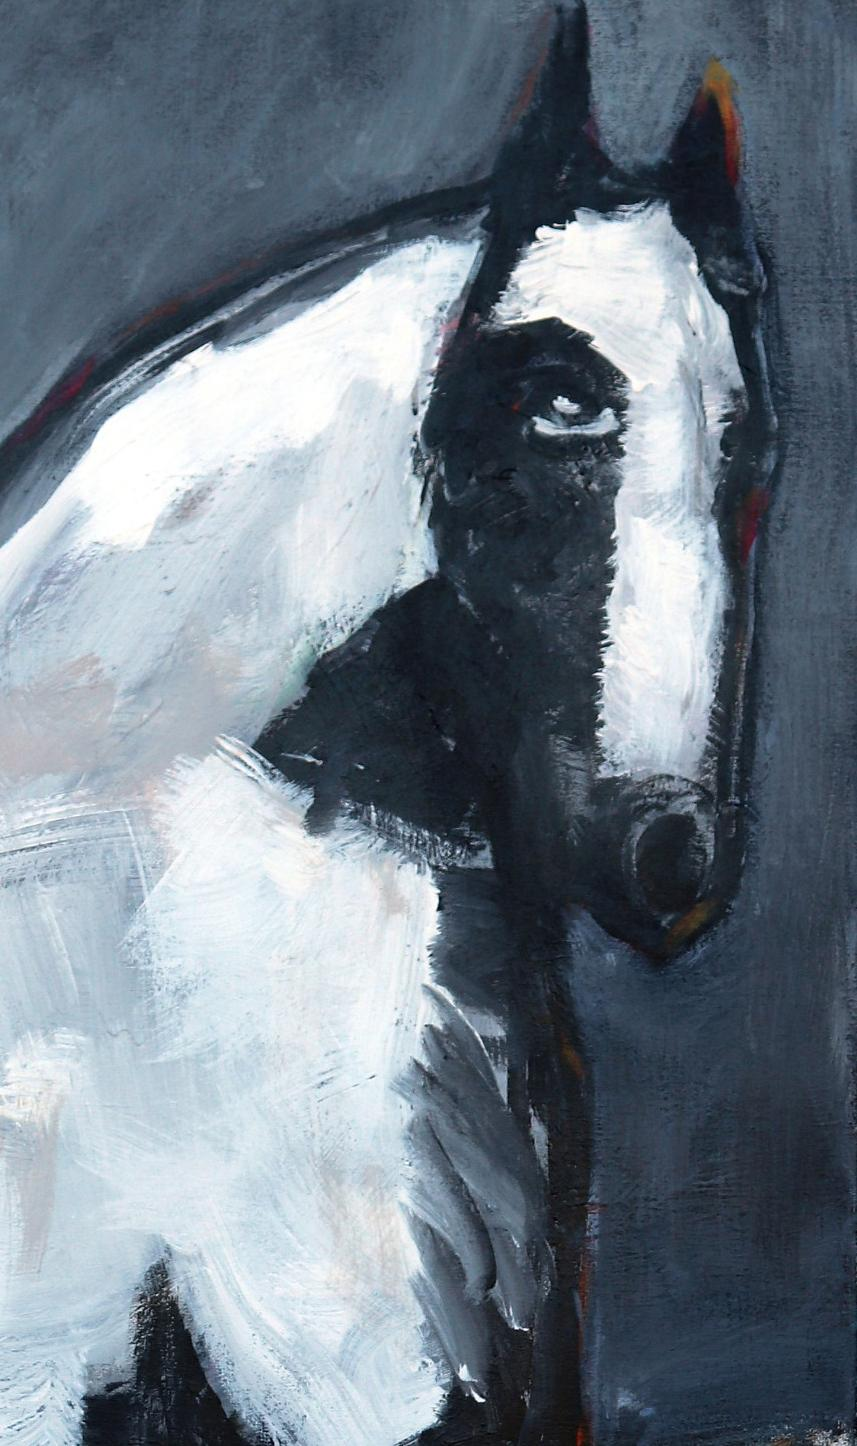 James Koskinas Gray Rider On White Horse For Sale At 1stdibs